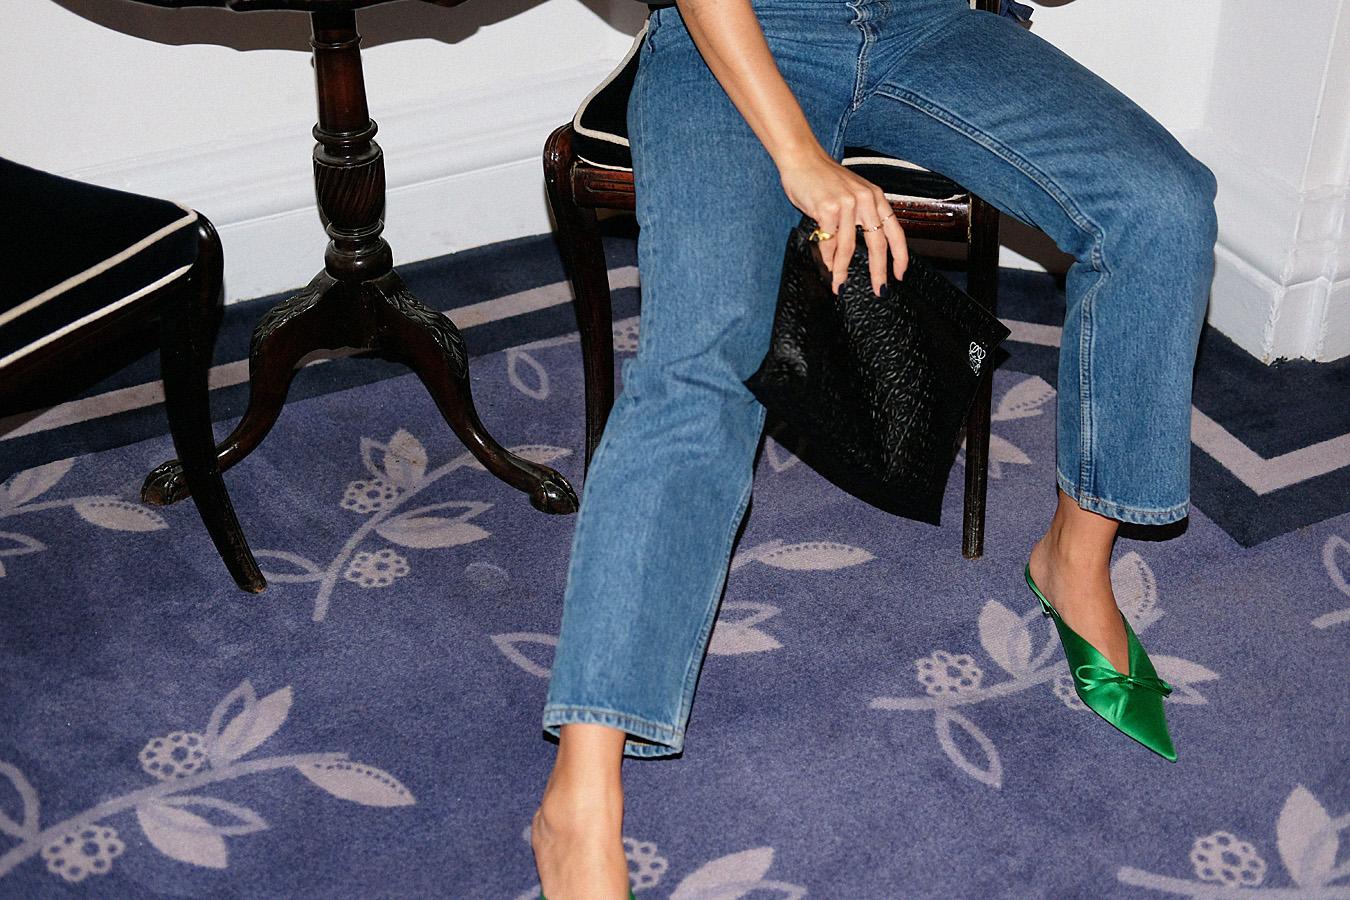 Desi is wearing: Balenciaga Knife mules, Totême Azurro top, Loewe T Pouch, denim jeans, Rhinestones earrings